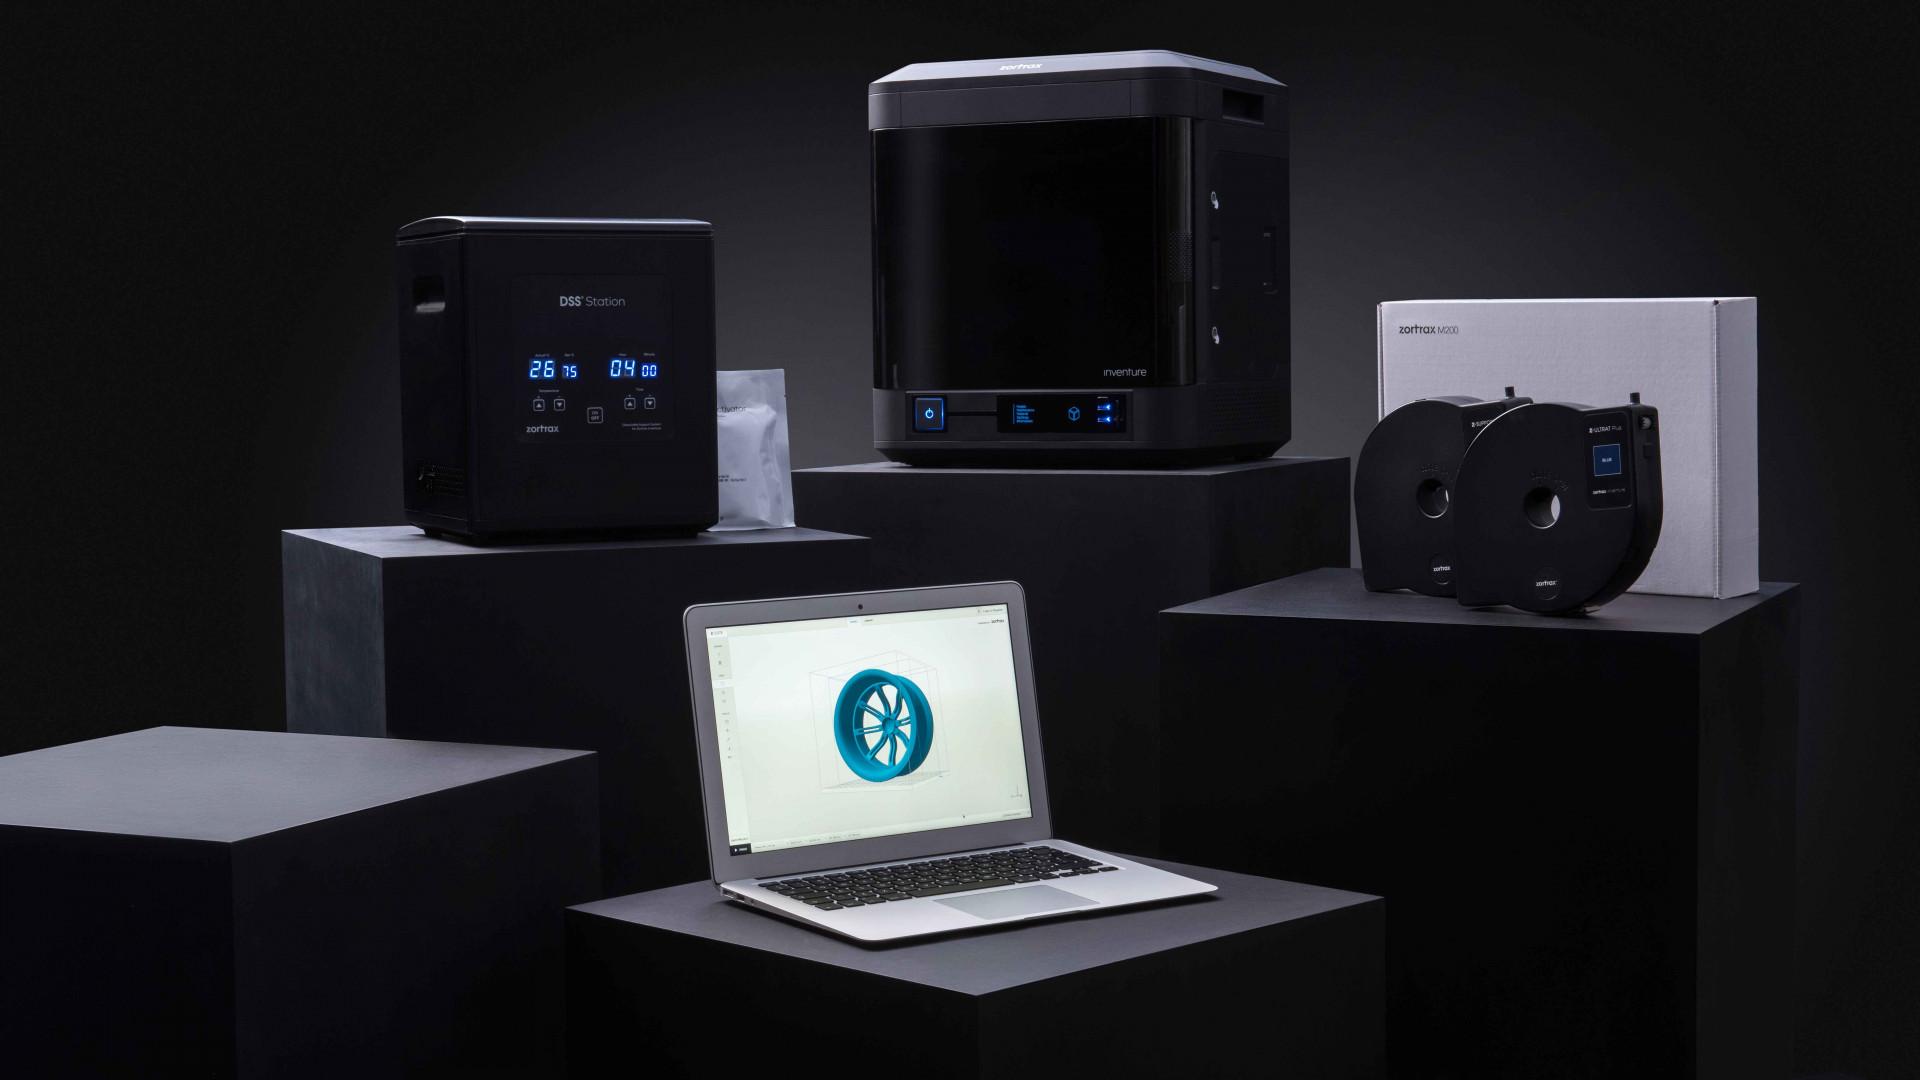 Zortrax Inventure: Smart, Simple, and Super Convenient | All3DP